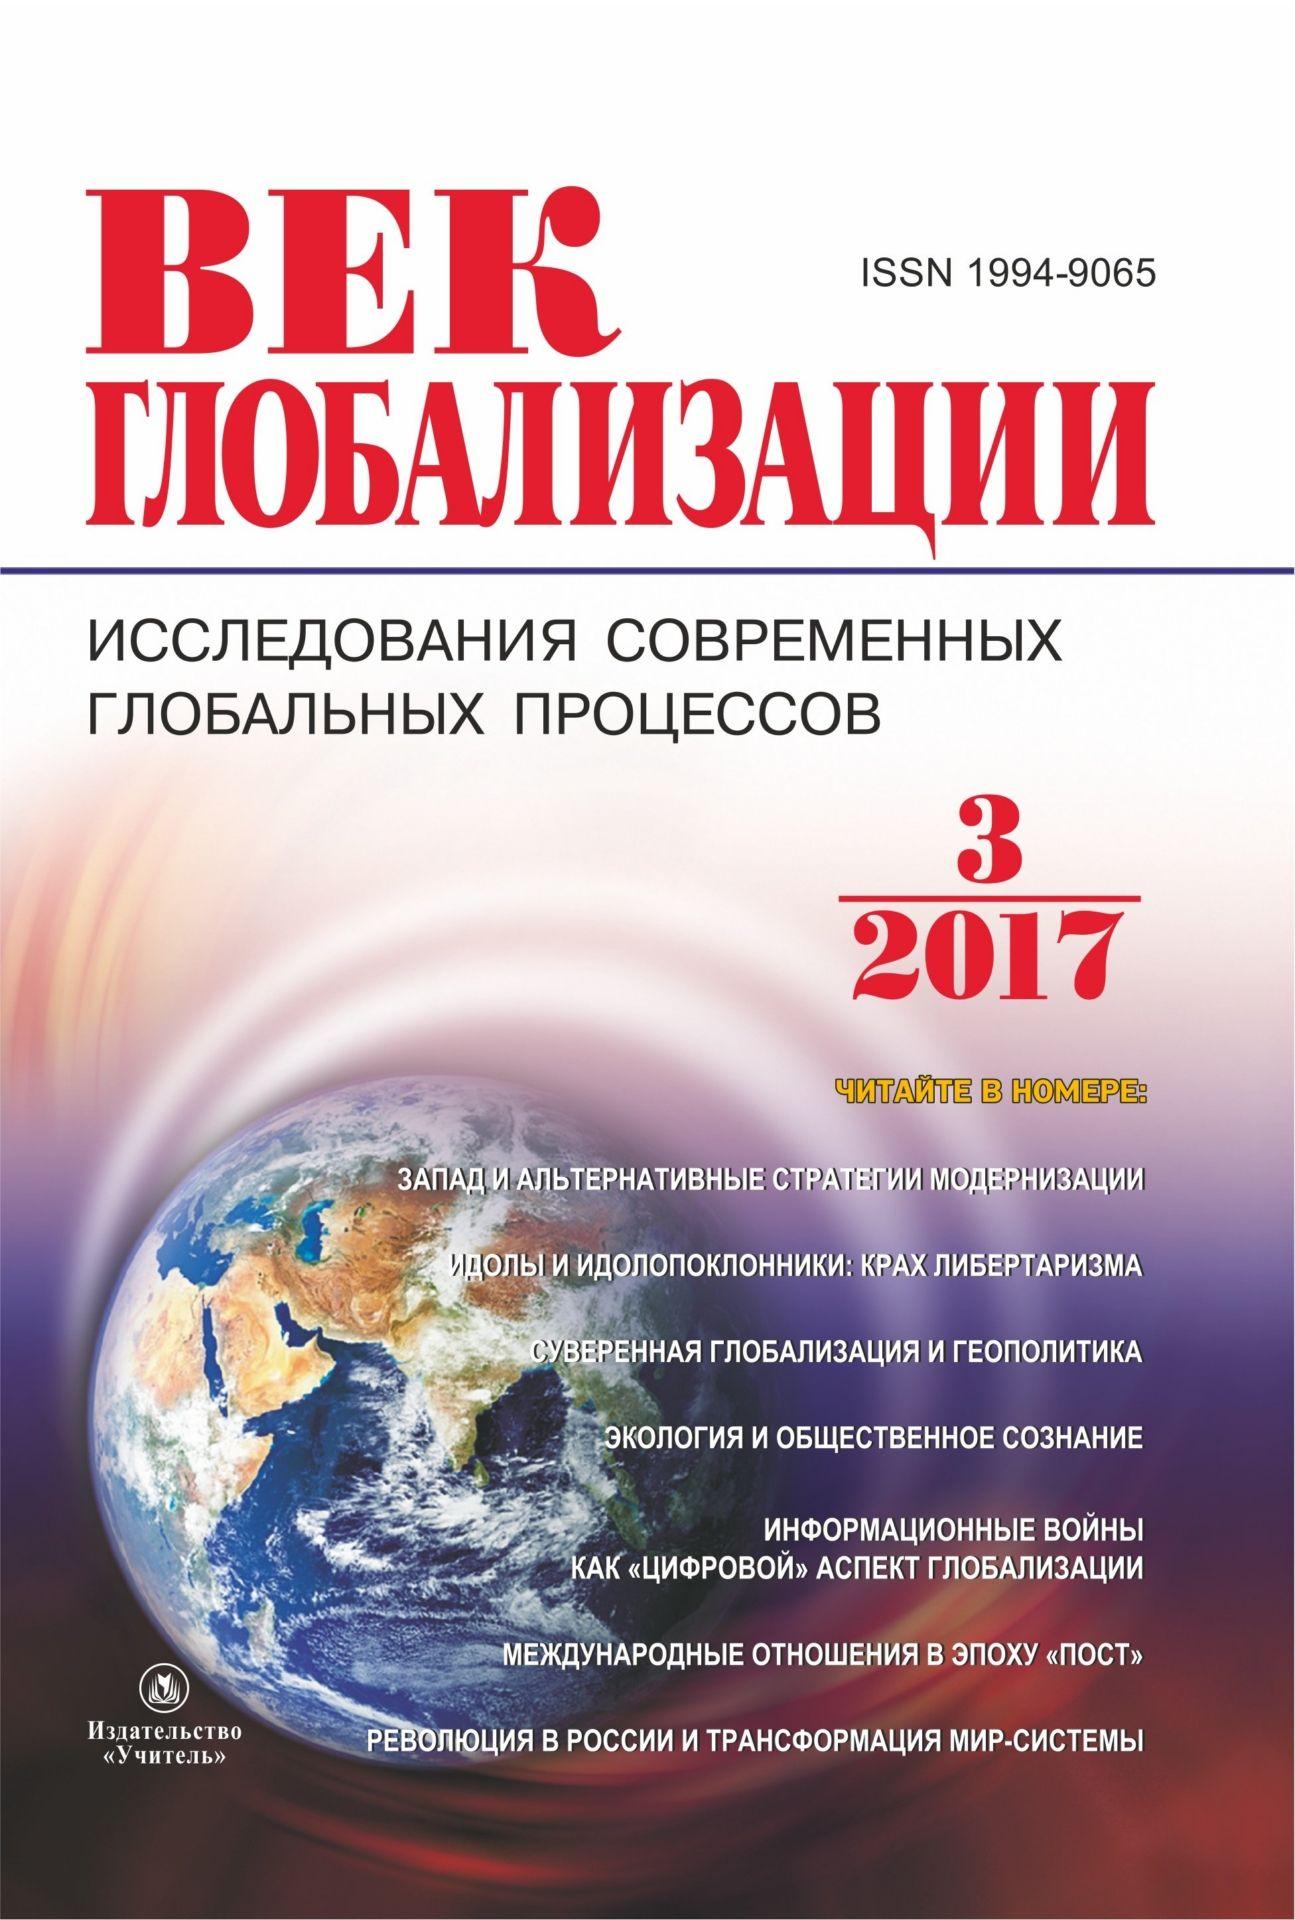 Журнал Век глобализации № 3 2017